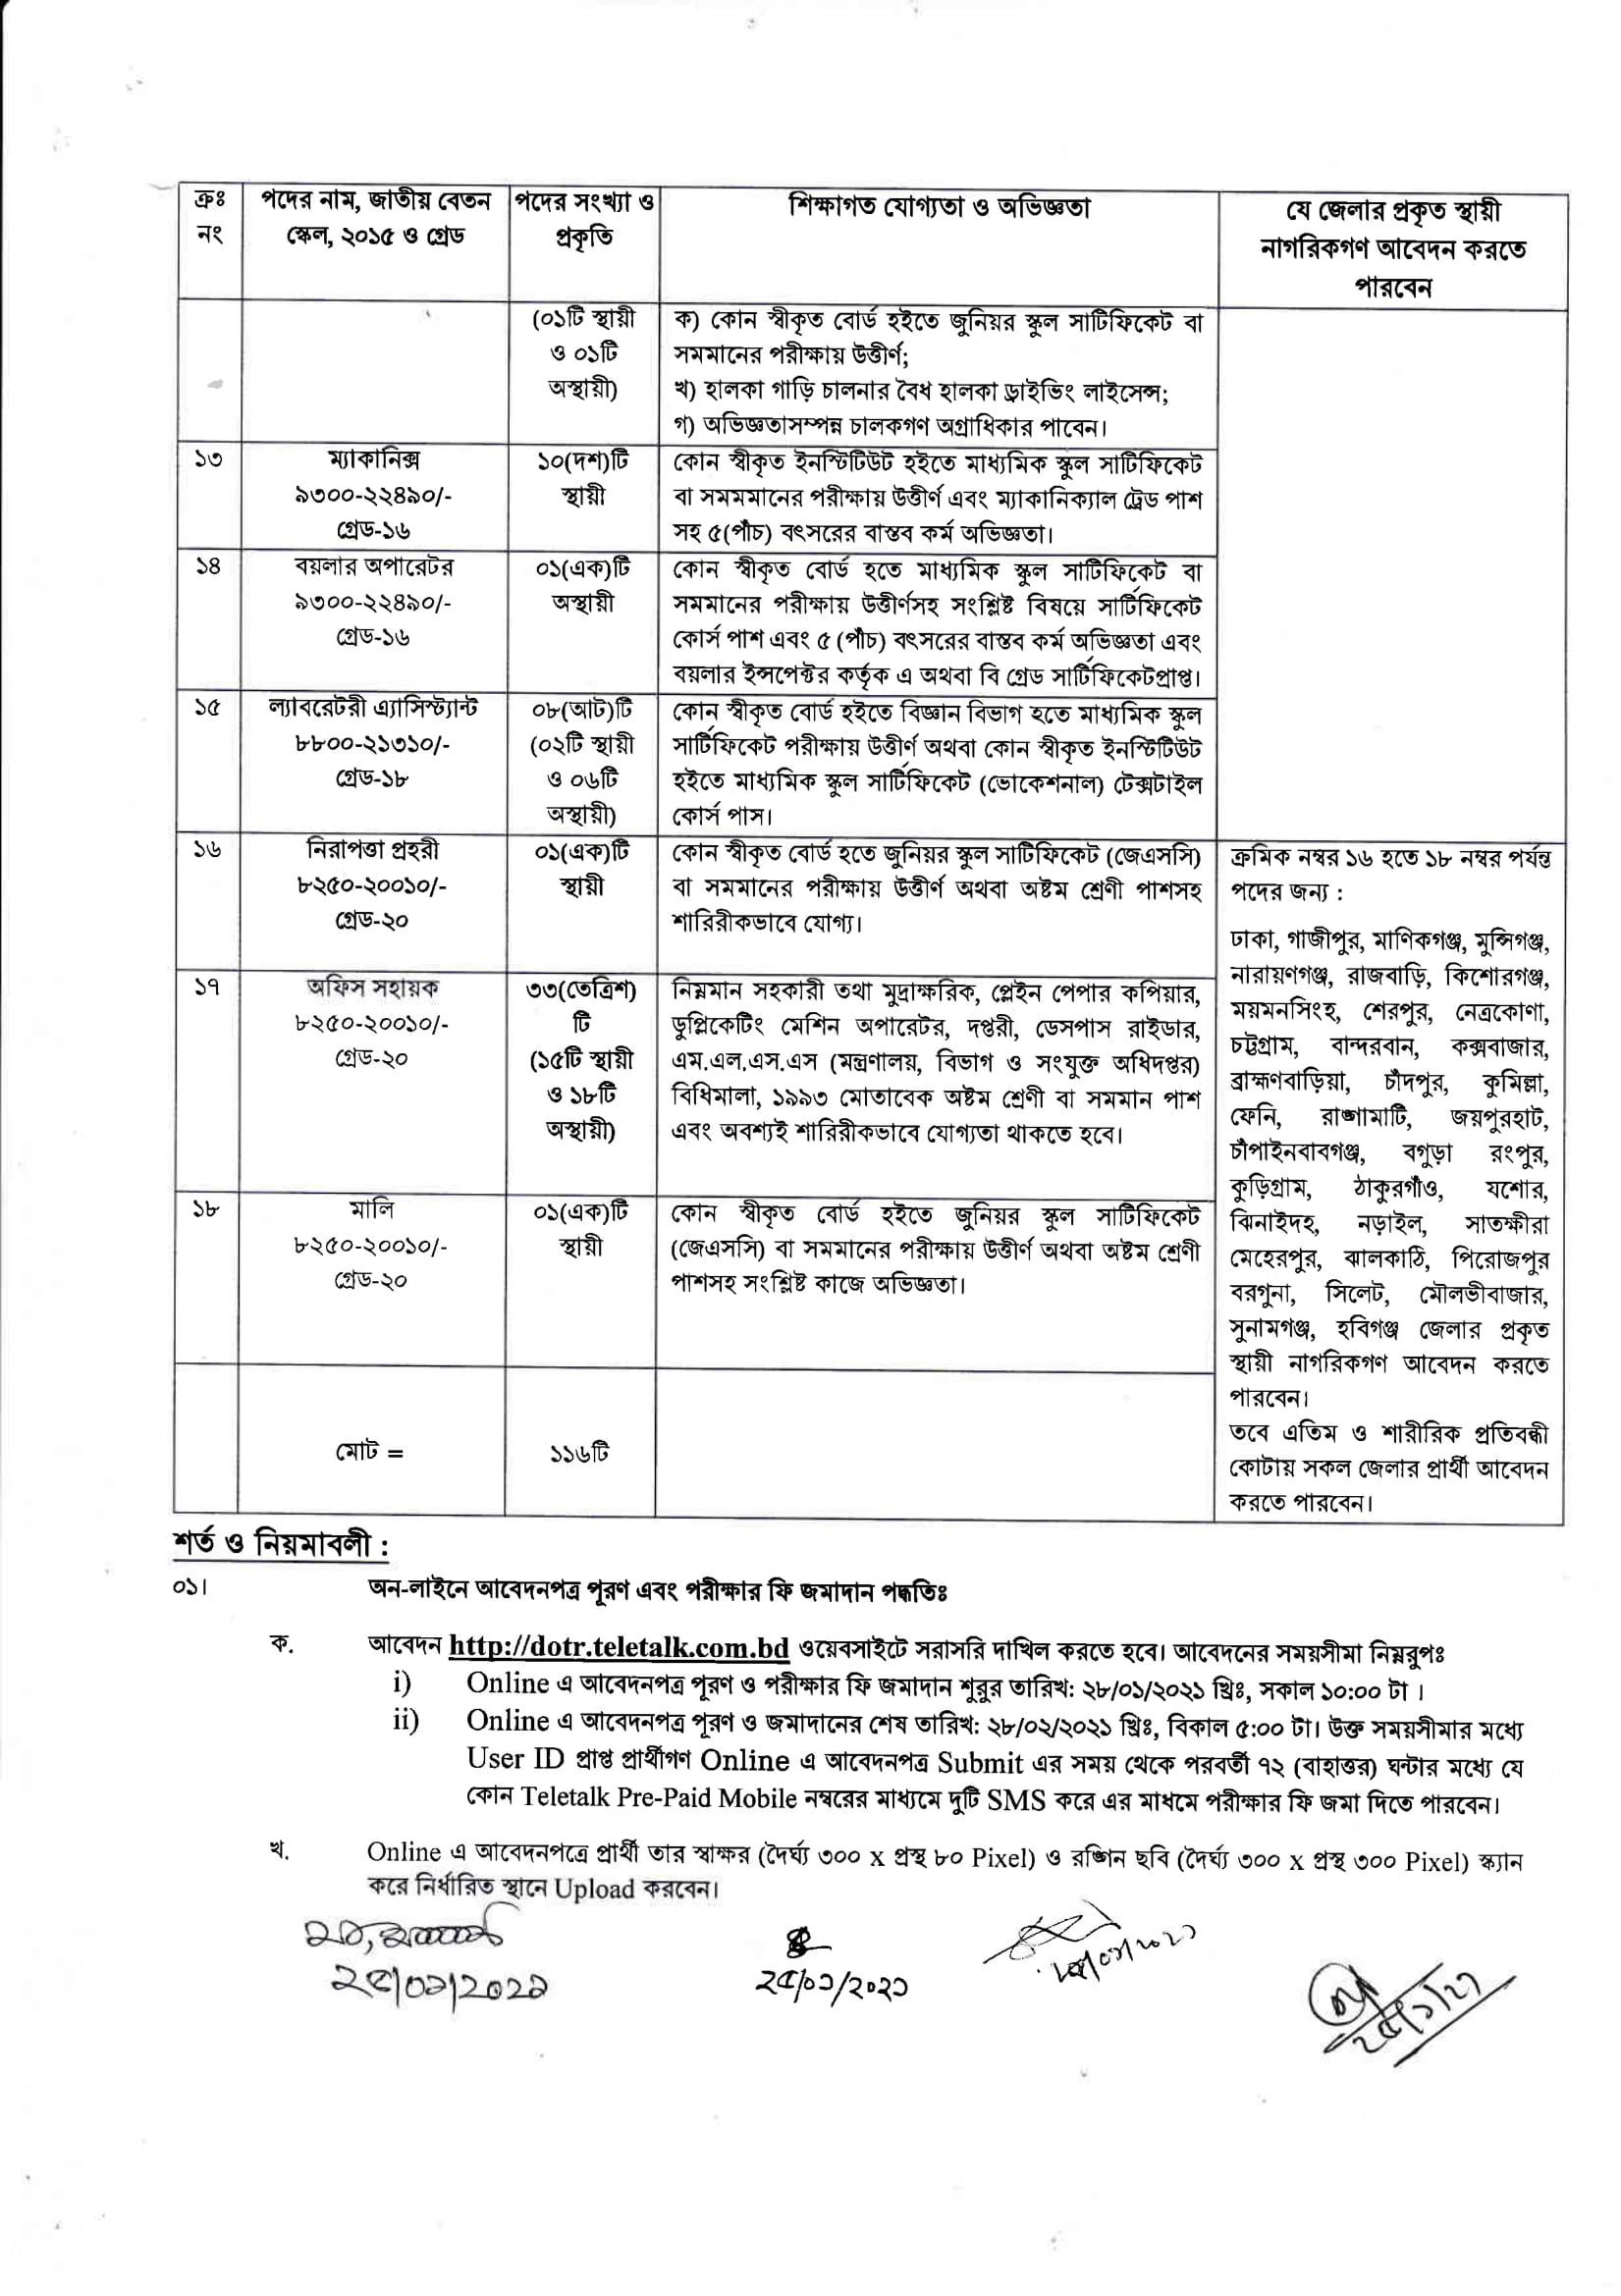 DOTR Teletalk 2021 - DOTR.teletalk.com.bd